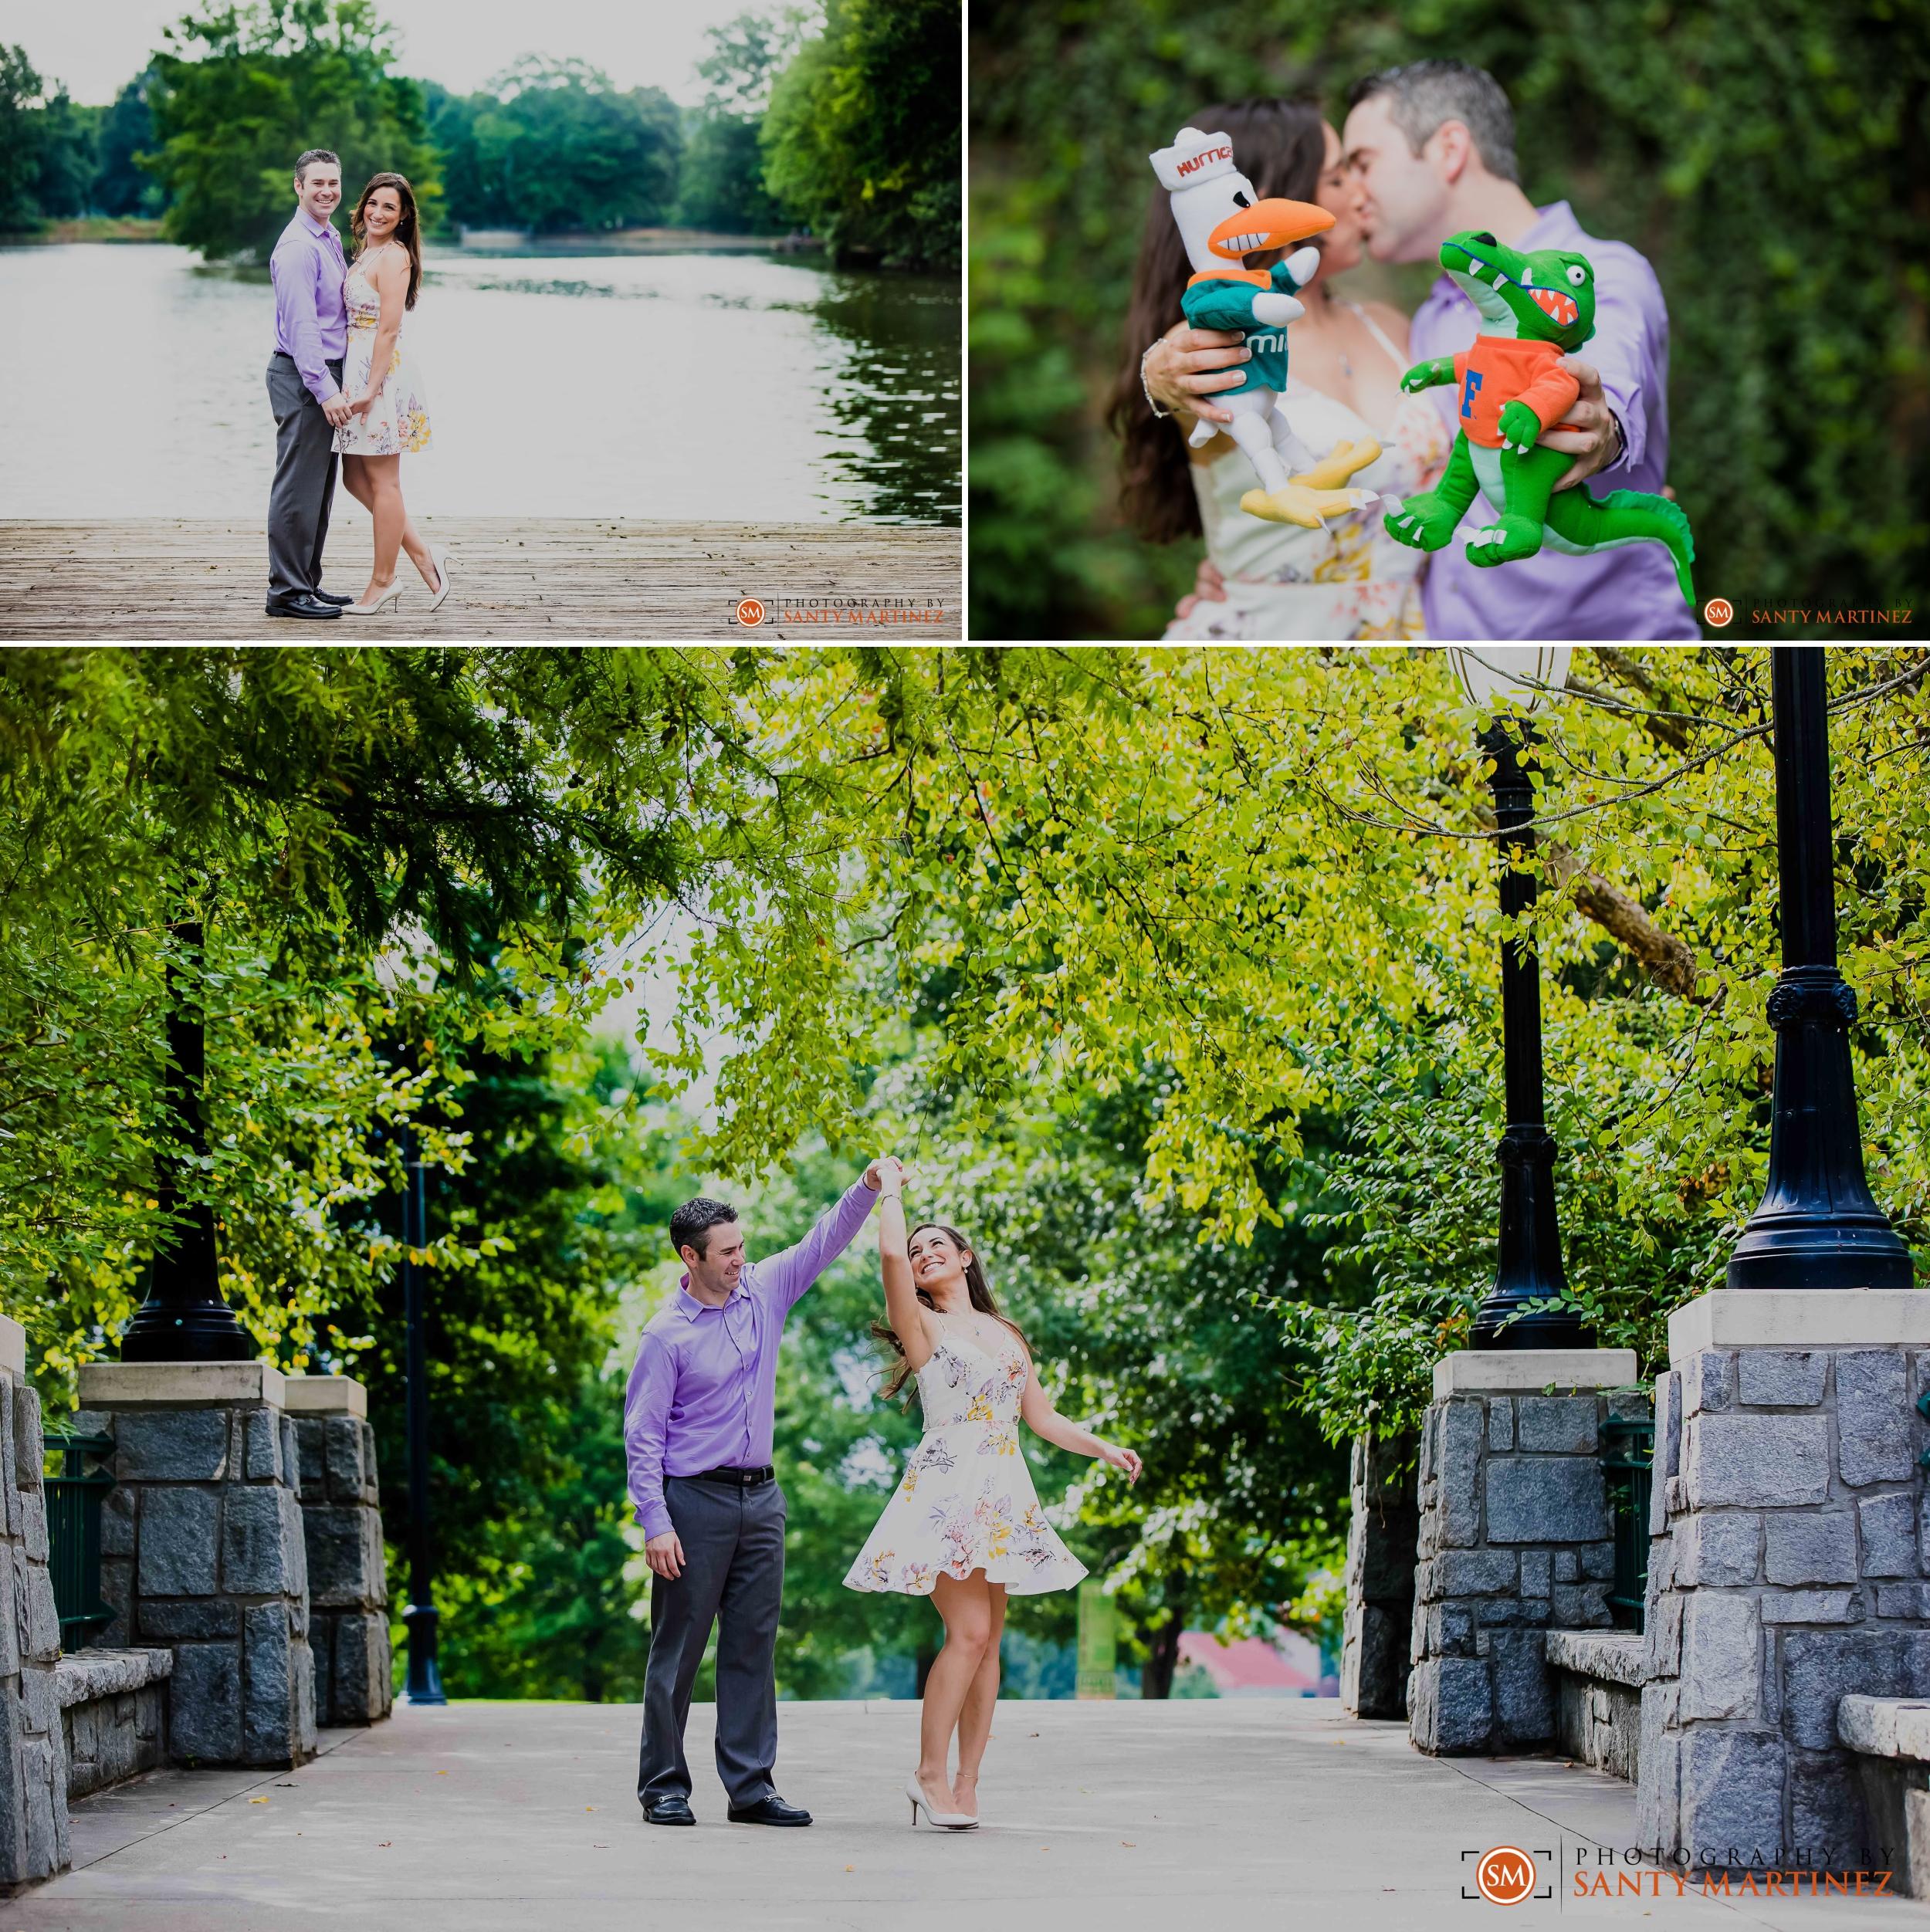 Engagement Session Piedmont Park - Santy Martinez Photography 2.jpg